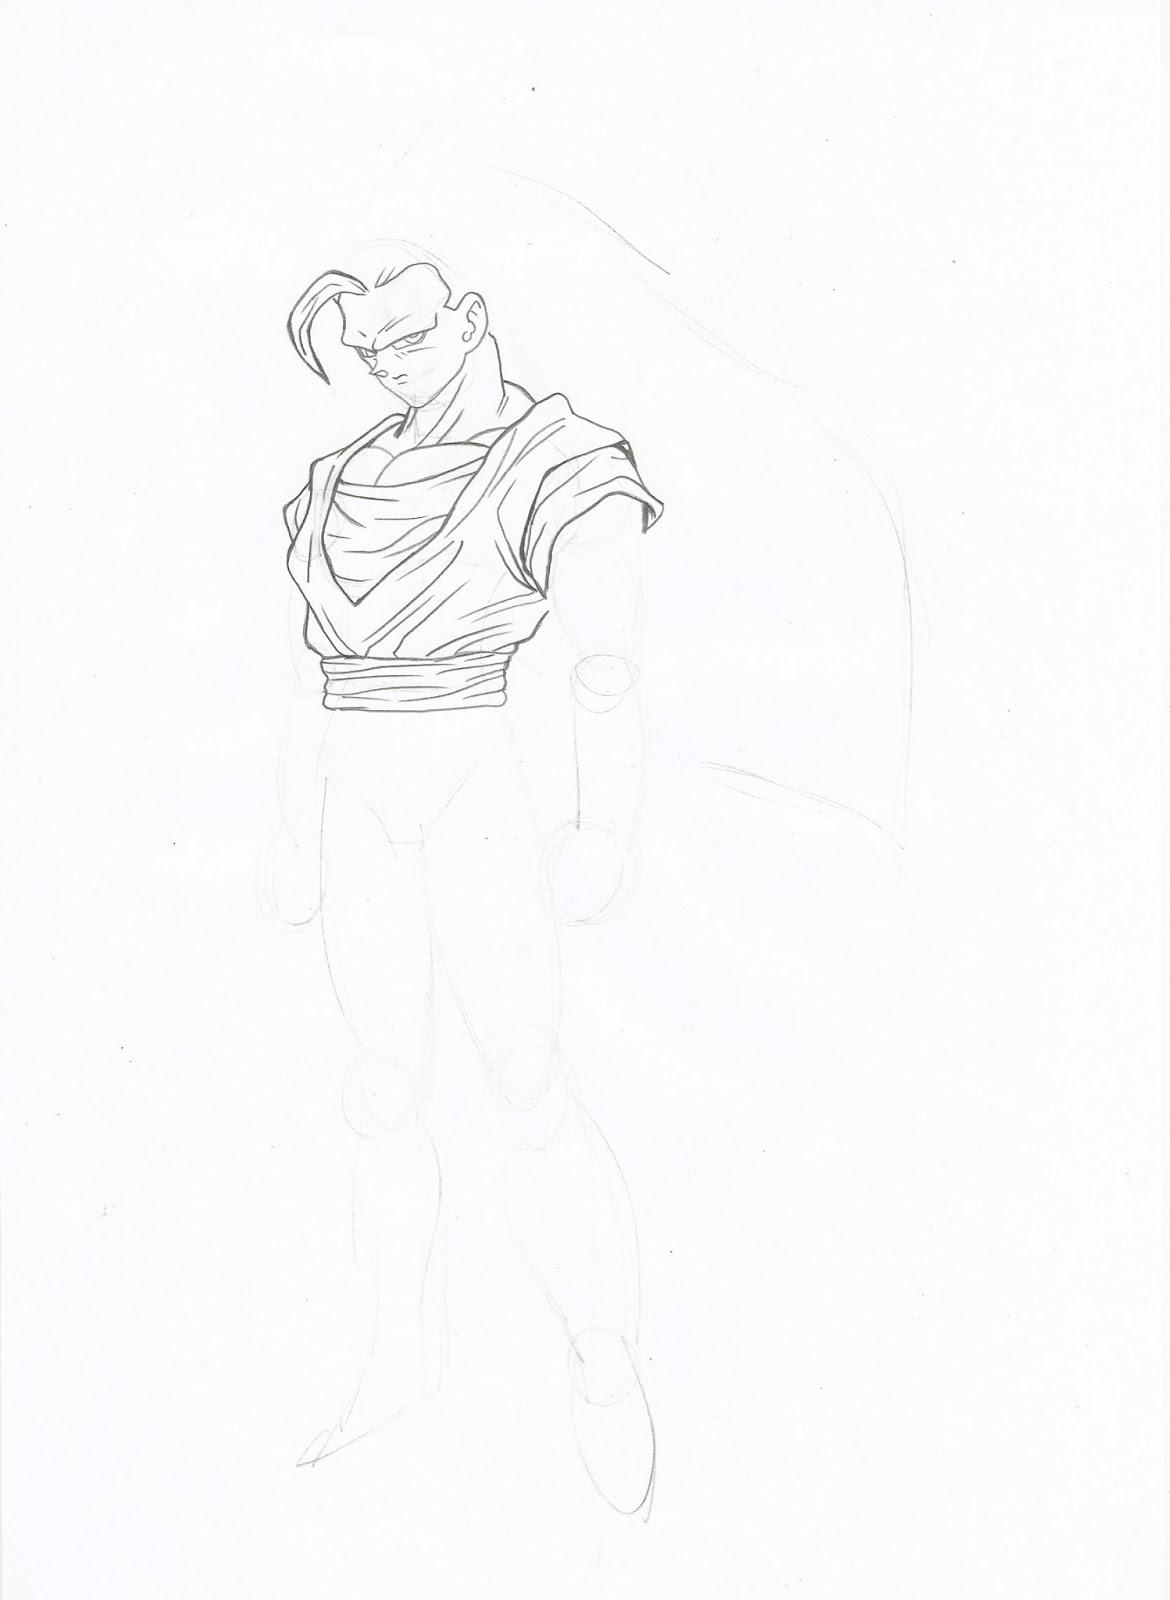 como desenhar goku super sayajin 3 ranimaart